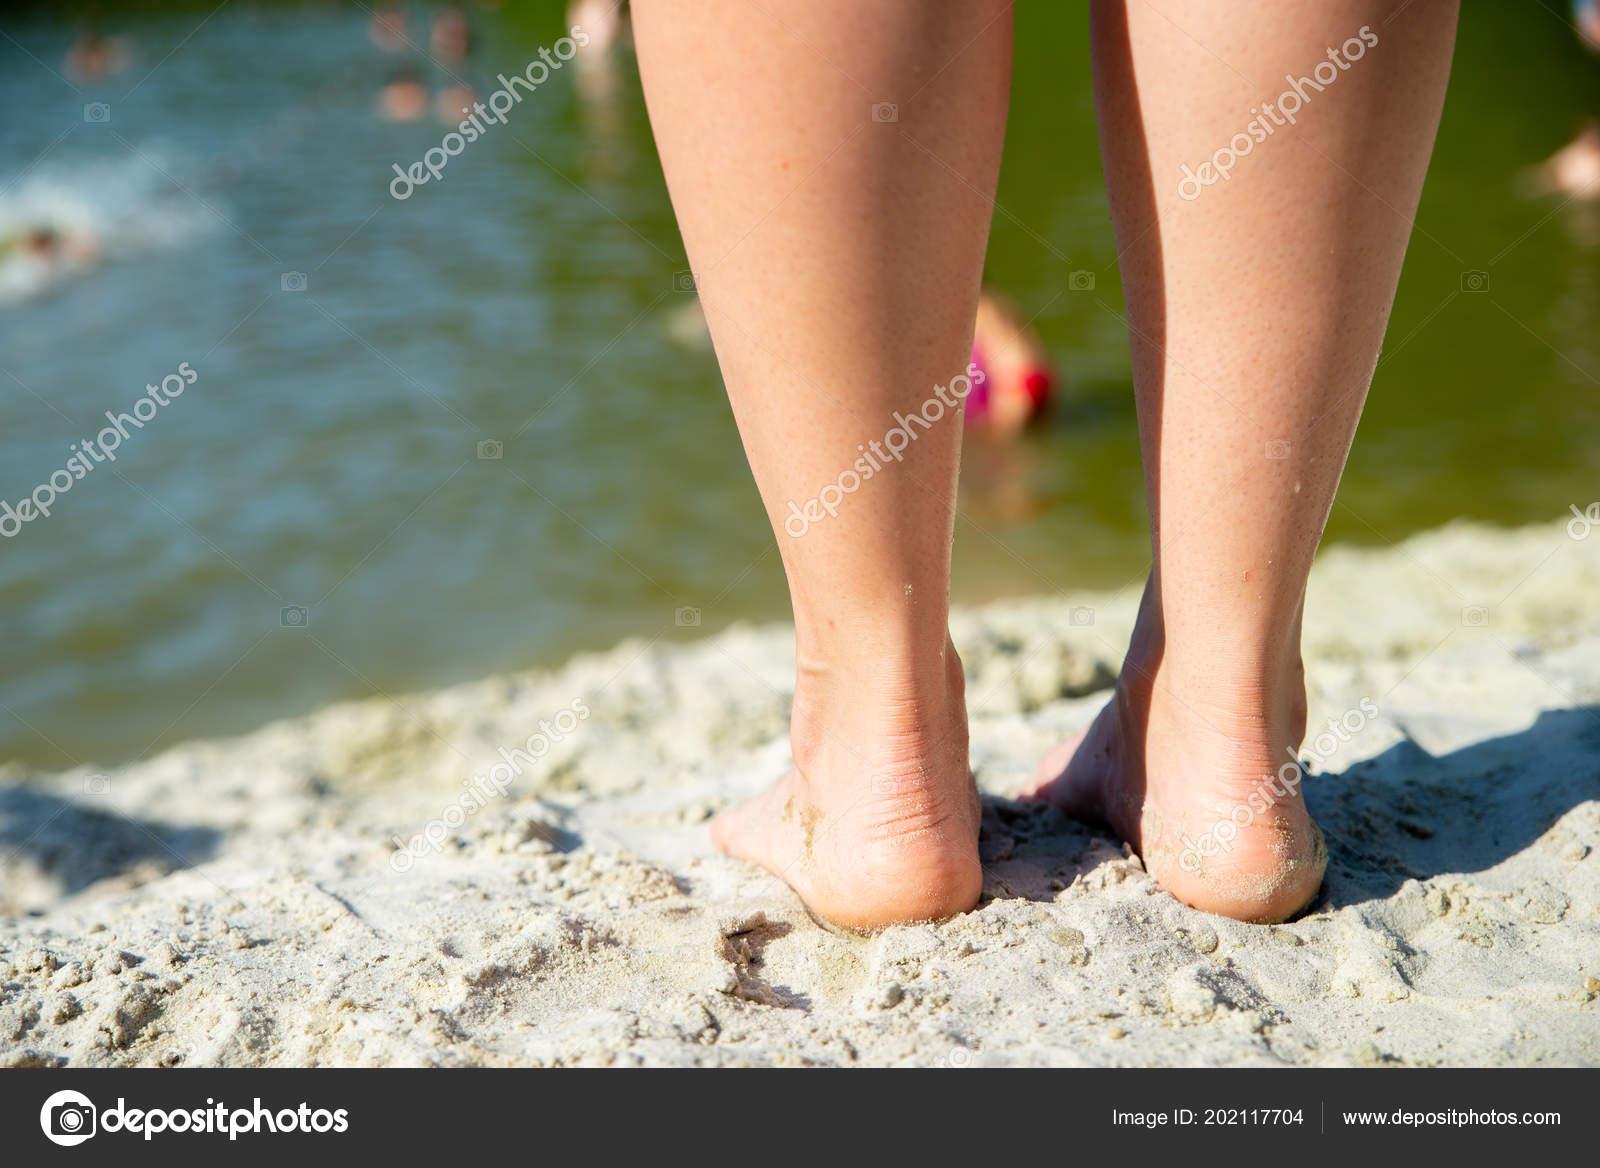 dde6ee0f9c Κλείνω Πόδια Της Γυναίκας Πόδια Από Την Παραλία Άμμο Έννοια– εικόνα αρχείου